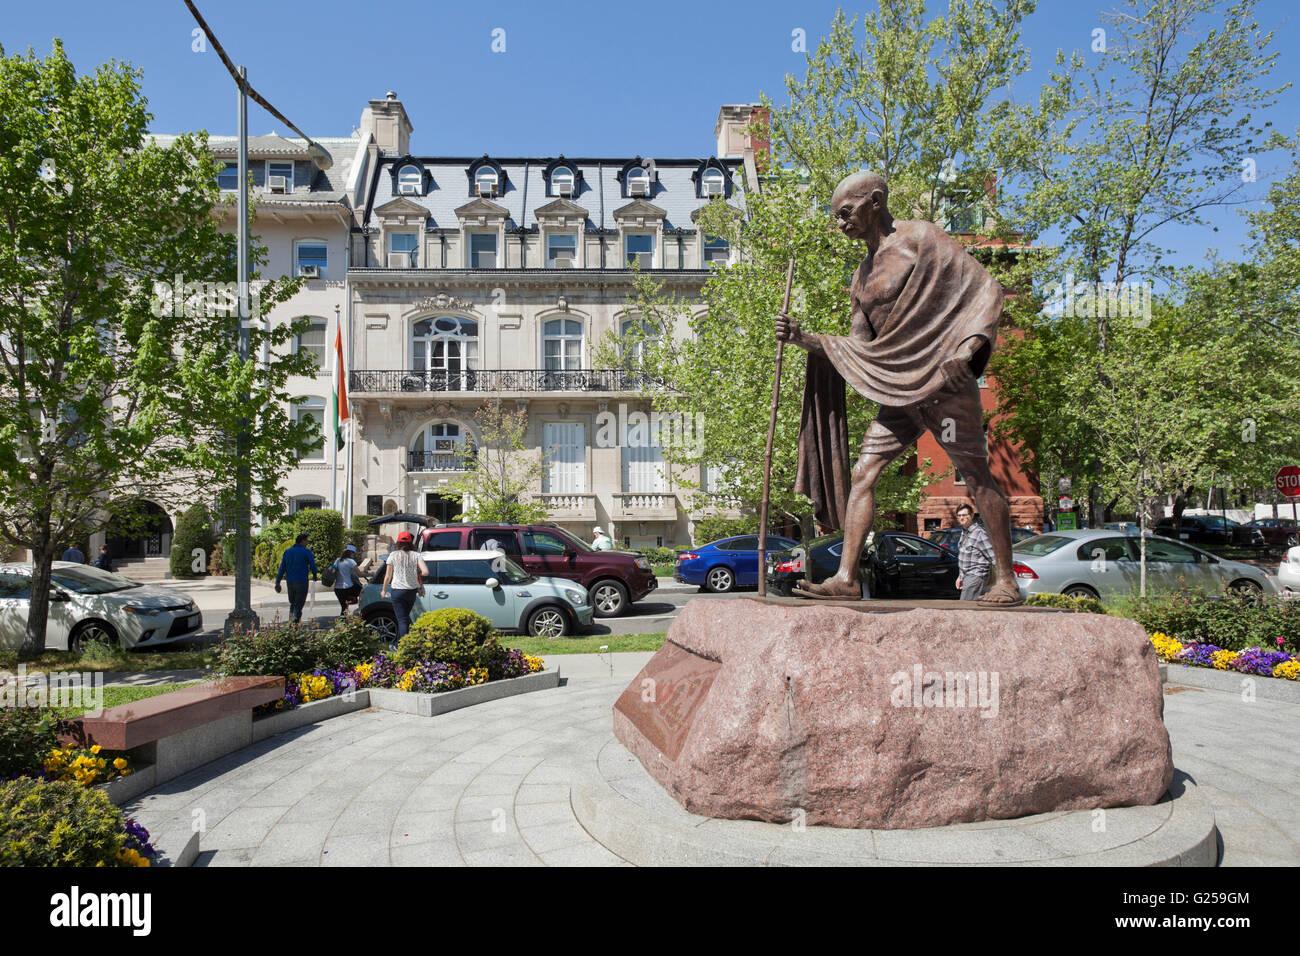 Mahatma Gandhi statue in front of the Embassy of India - Washington, DC USA - Stock Image